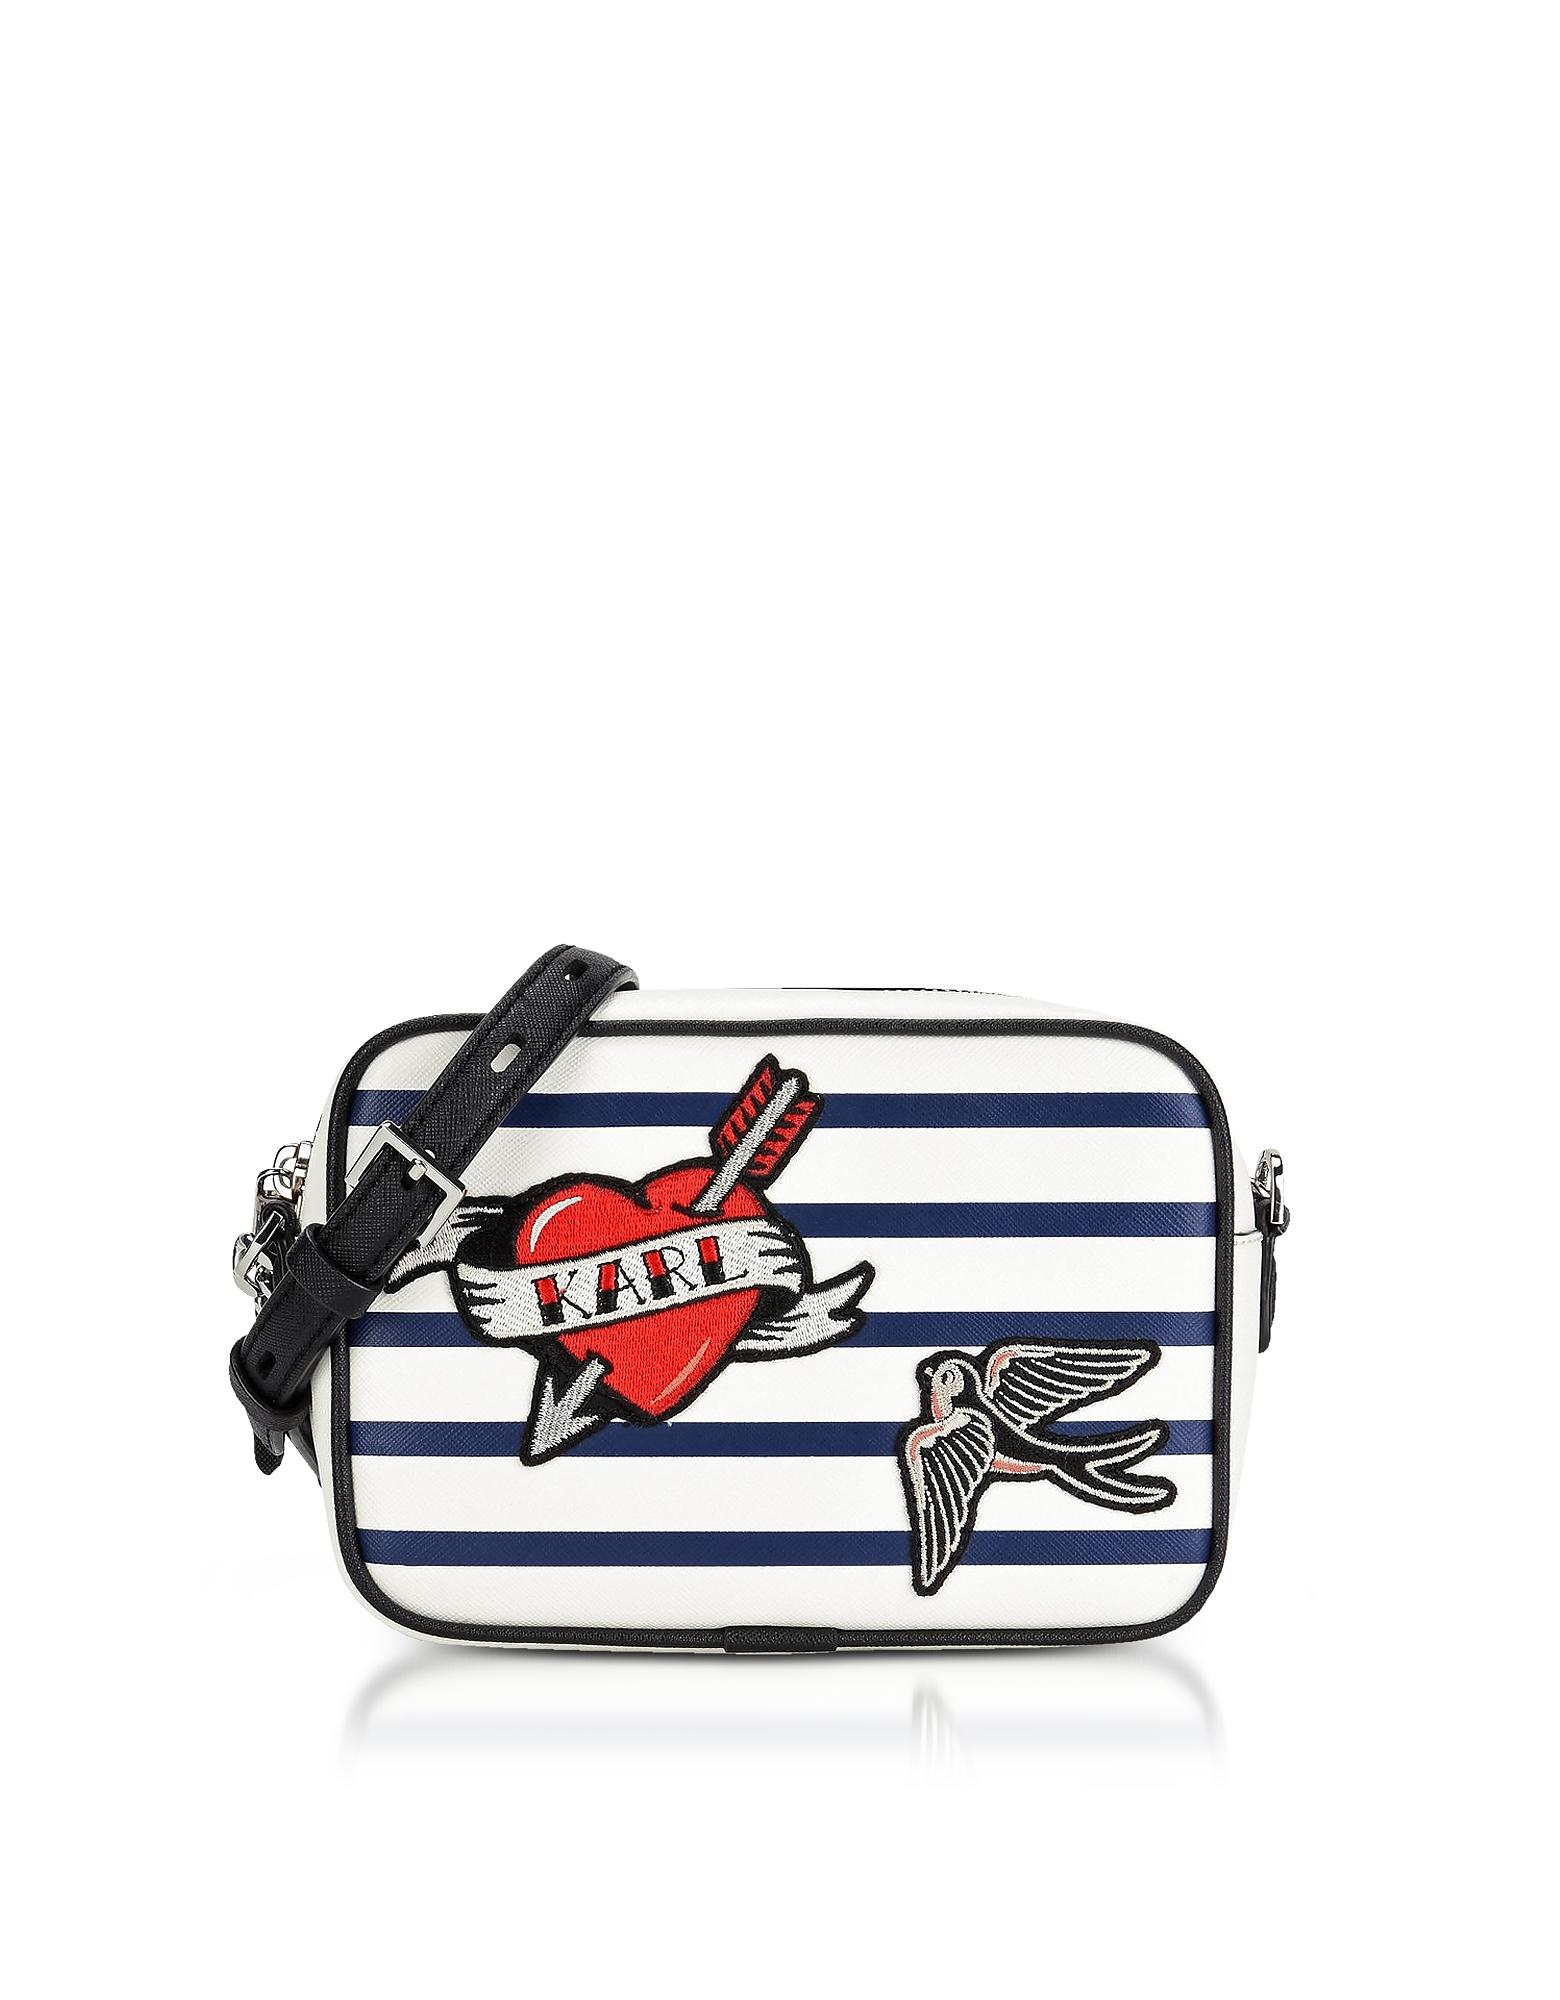 Captain Karl Crossbody Bag